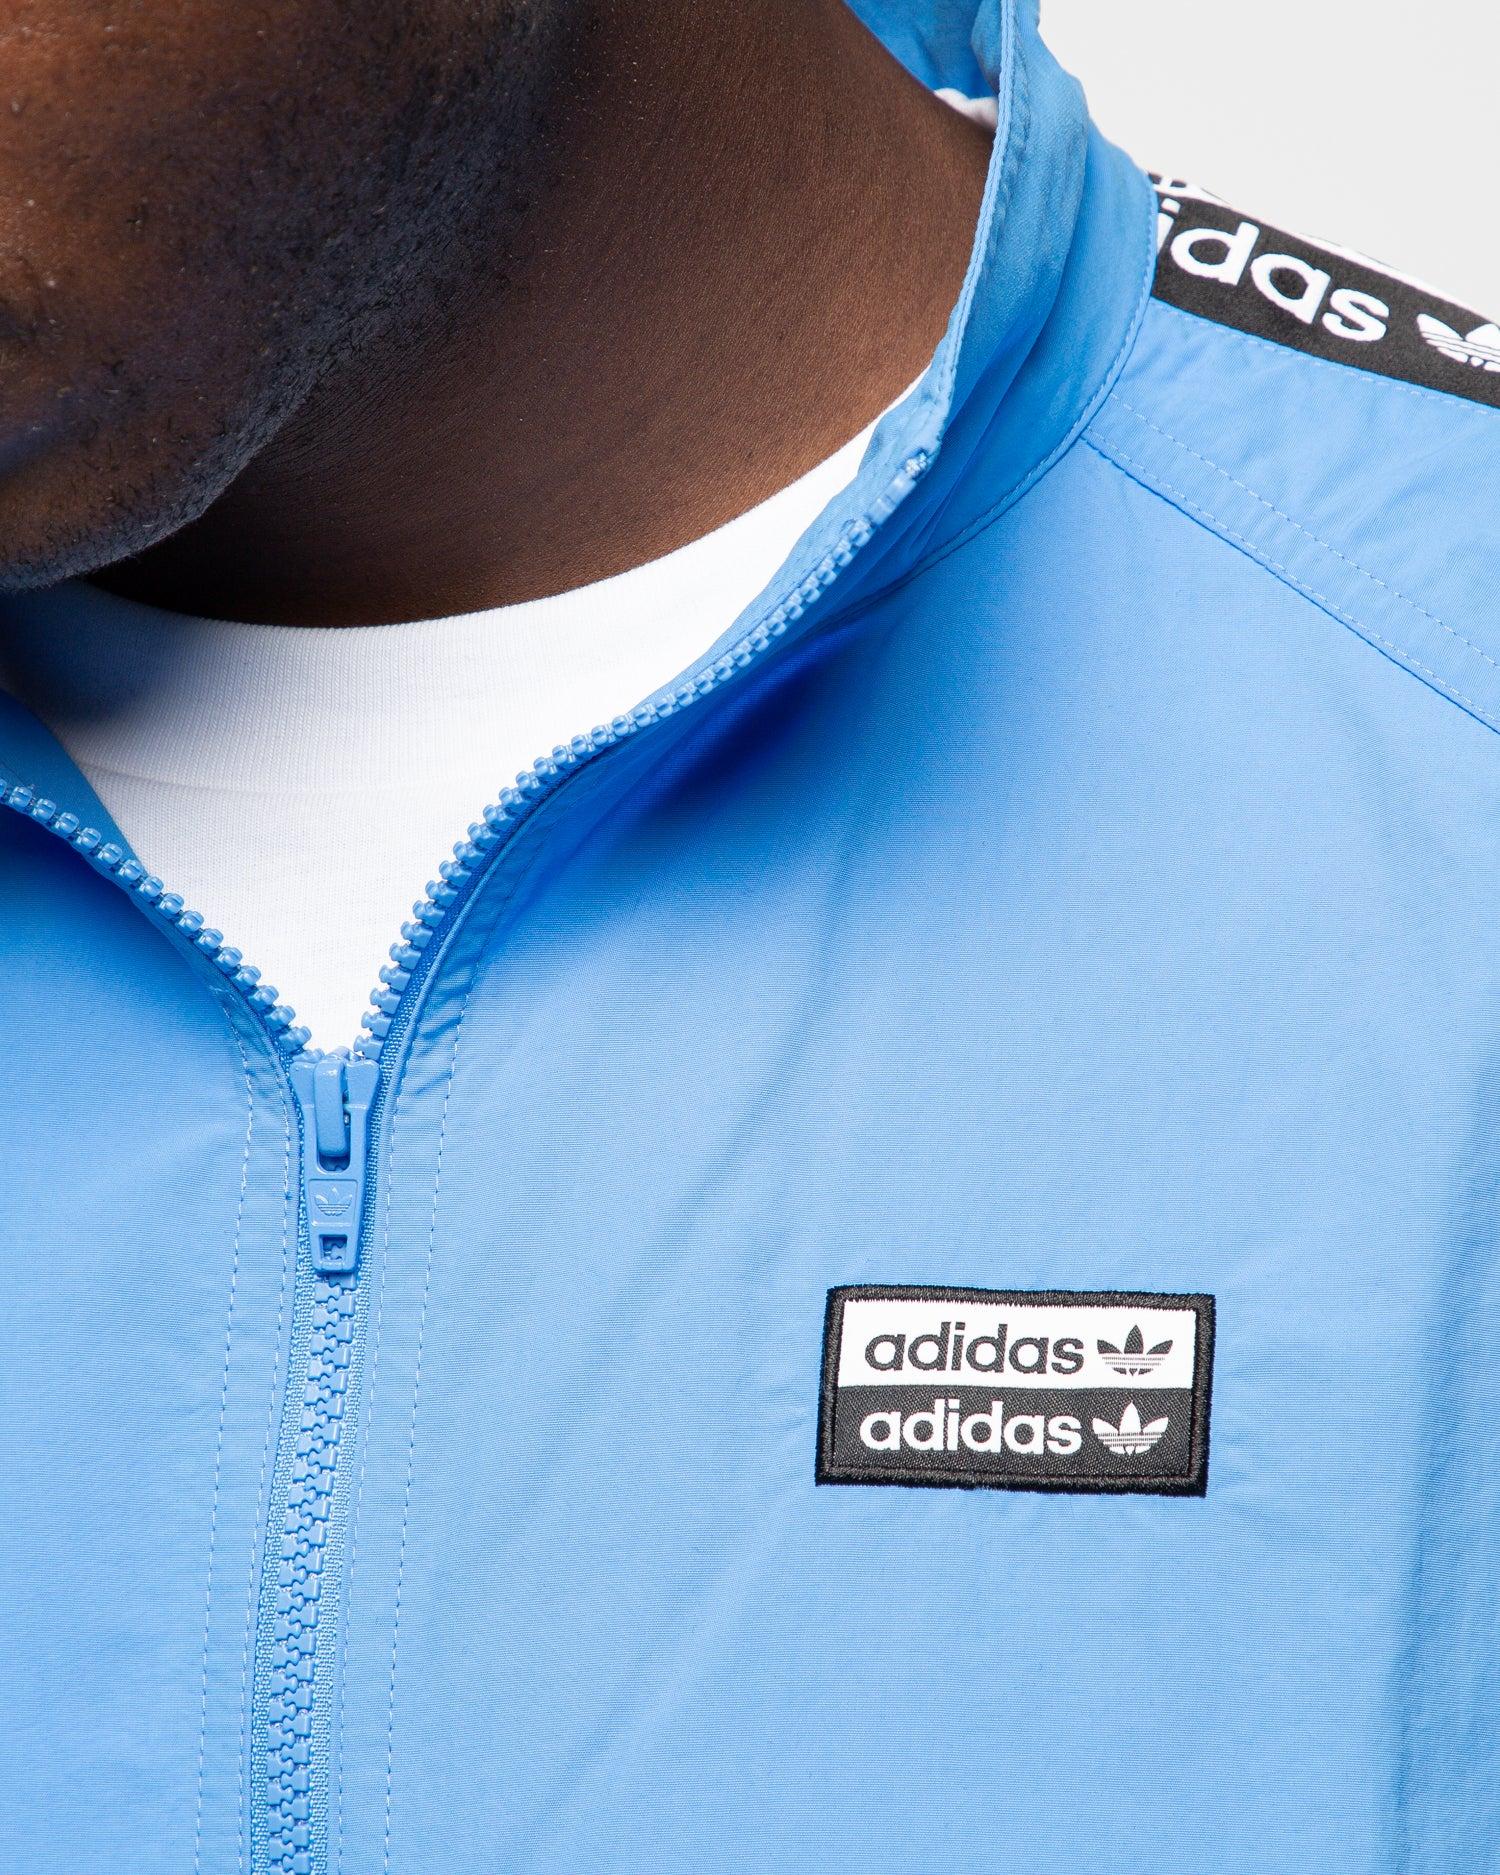 Adidas Vocal Track Jacket Blue